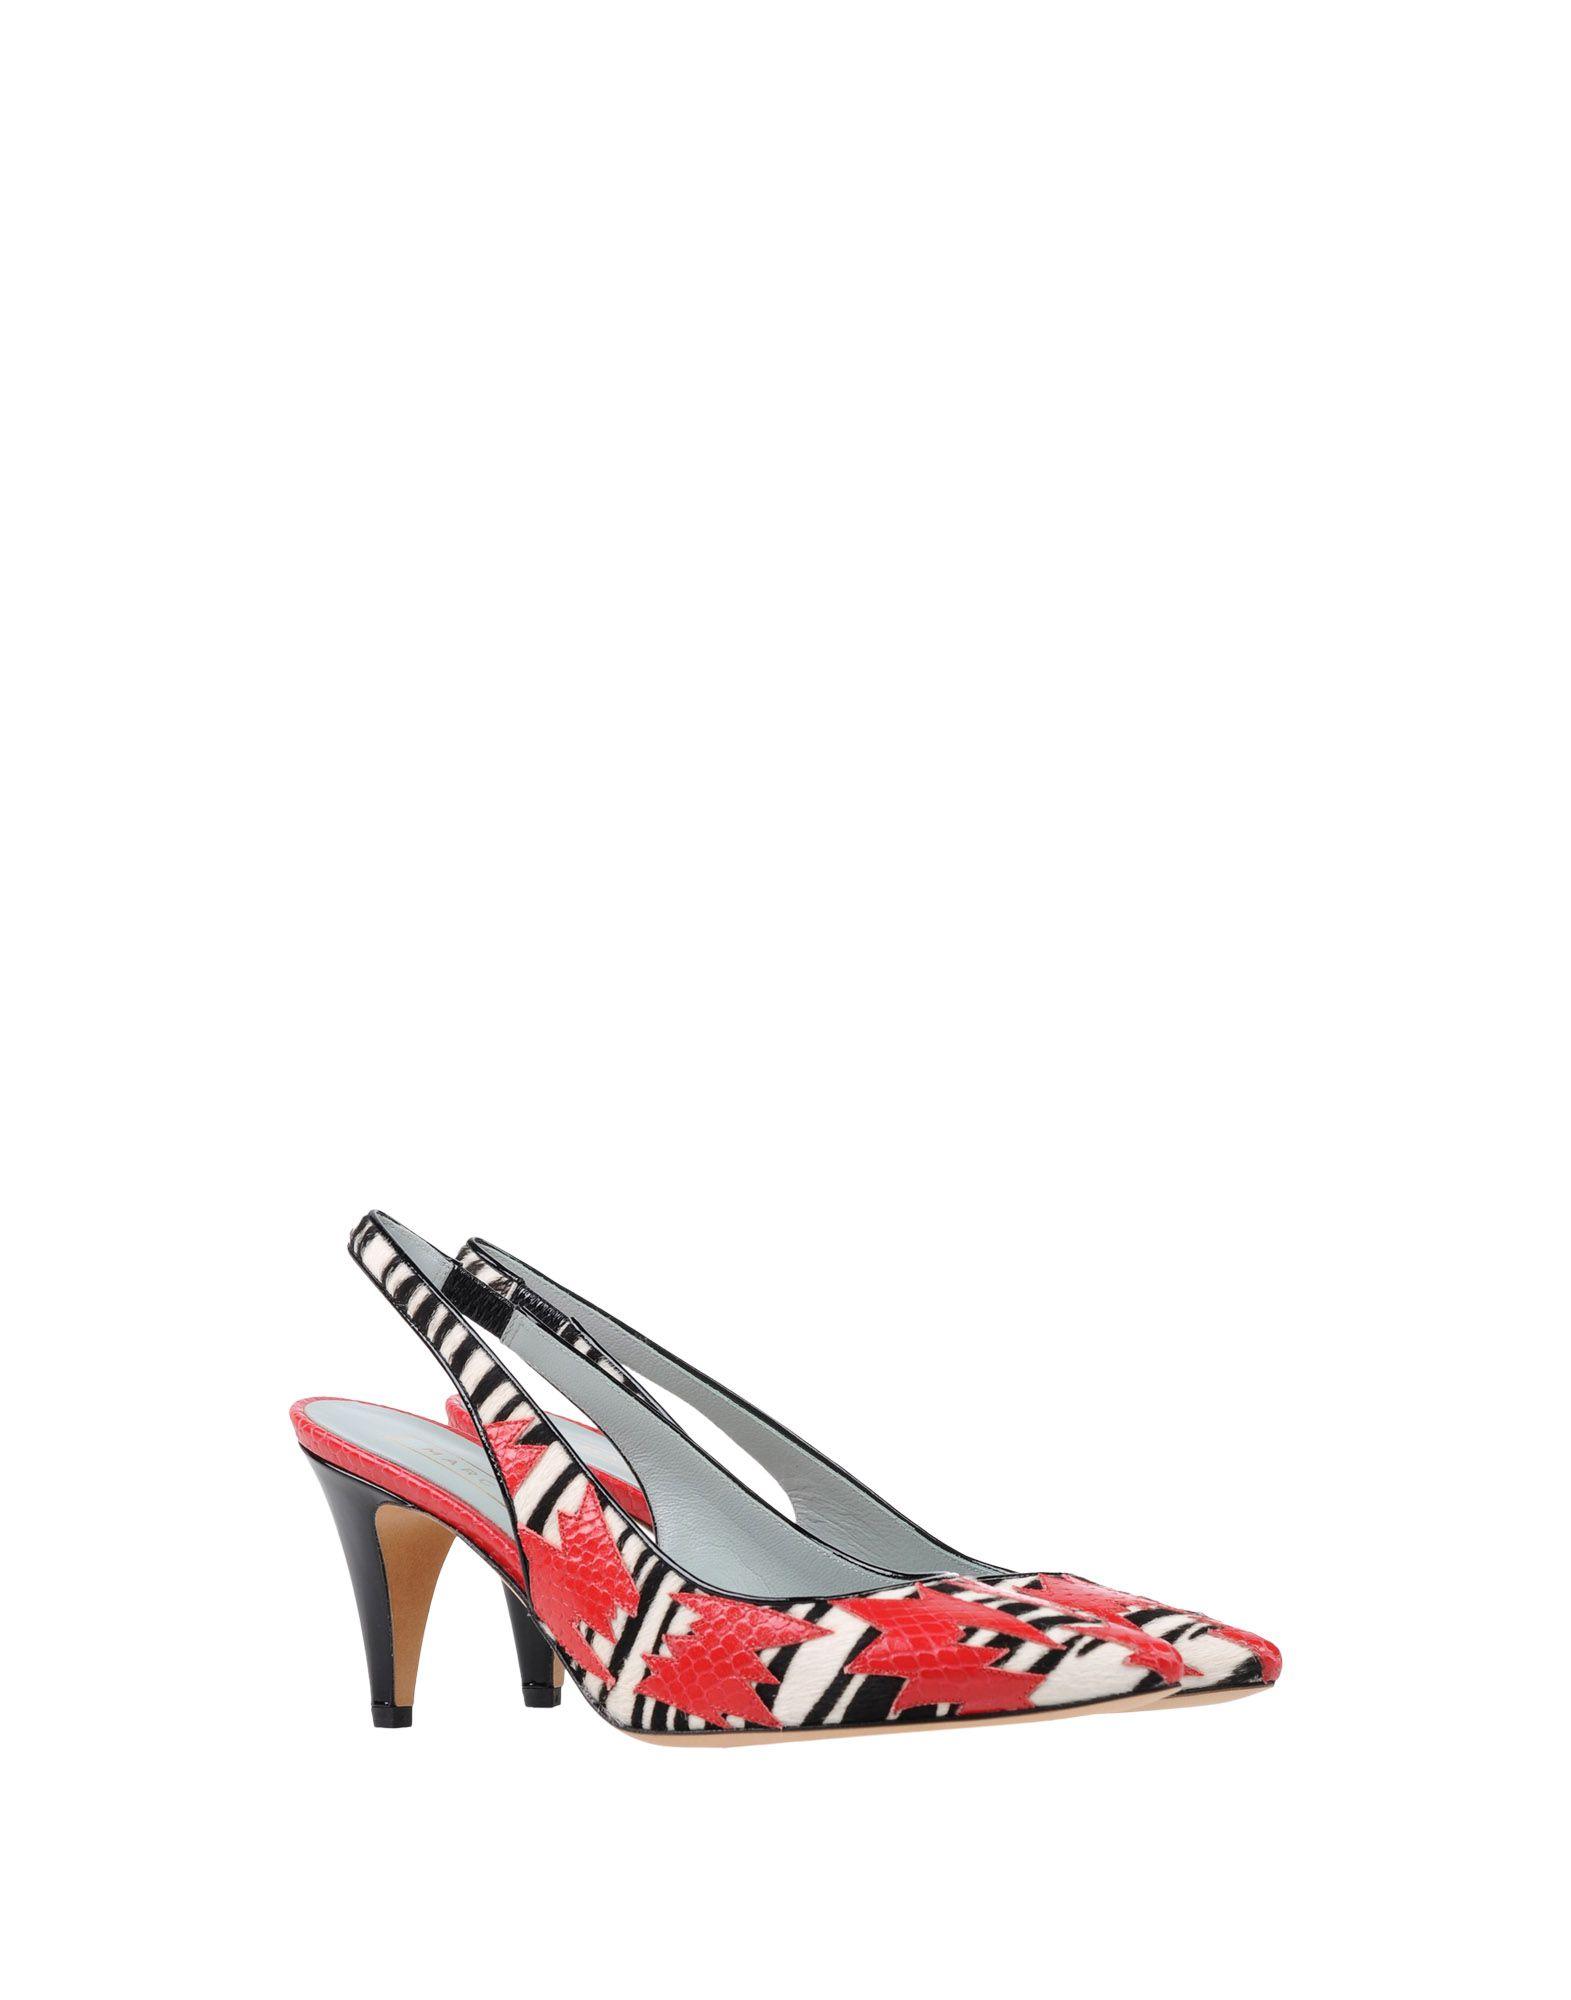 Marc Jacobs Pumps Qualität Damen  11381072HL Gute Qualität Pumps beliebte Schuhe 8cead2